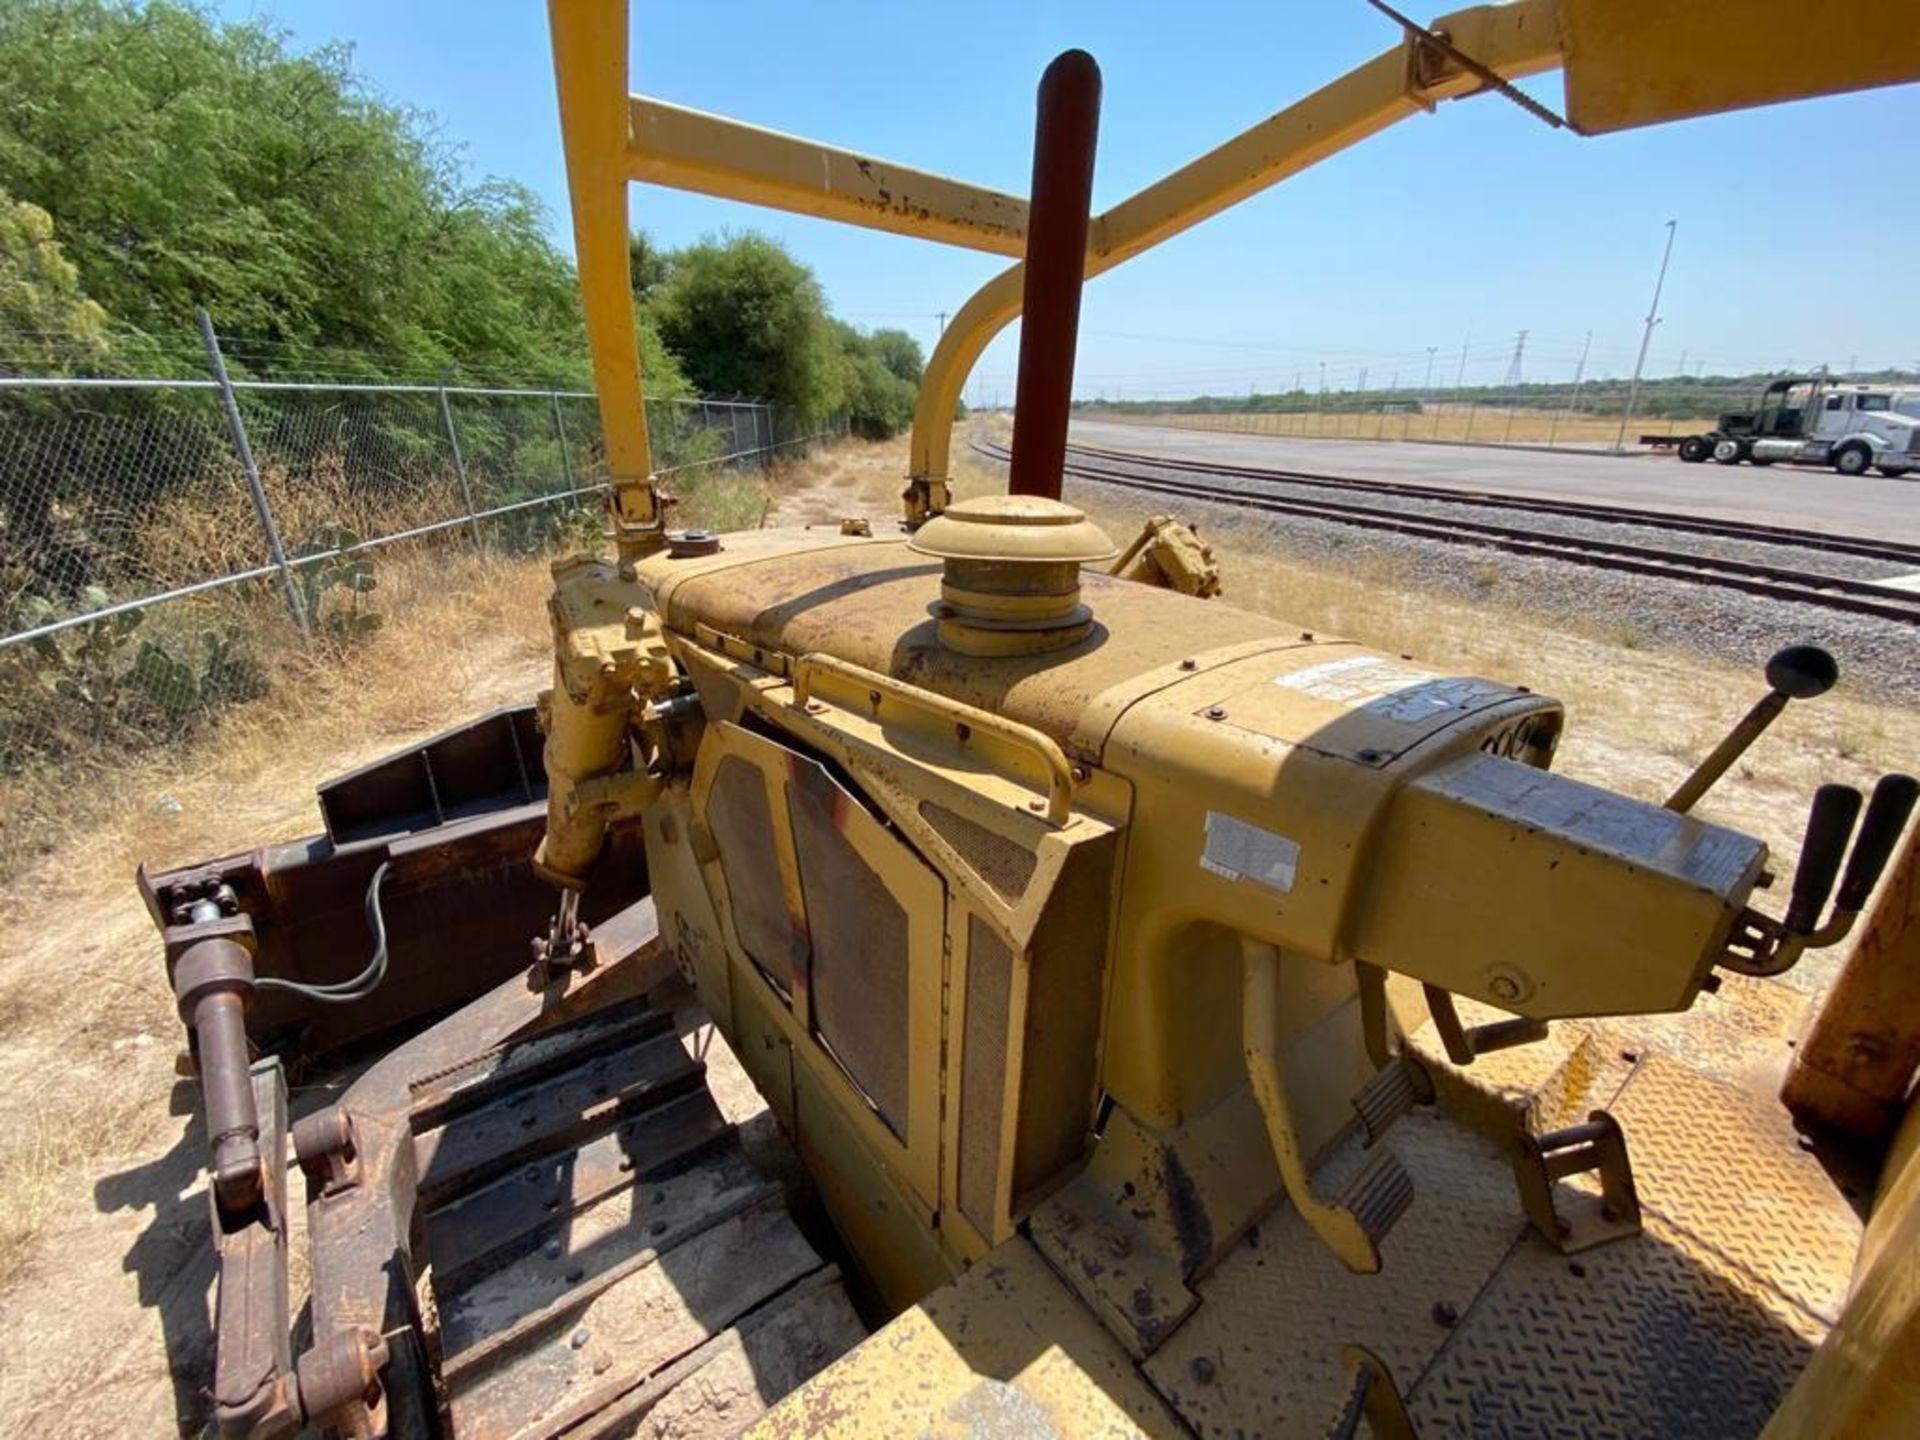 Caterpillar D7G Bulldozer, Serial number 92V5897, Diesel motor - Image 22 of 48